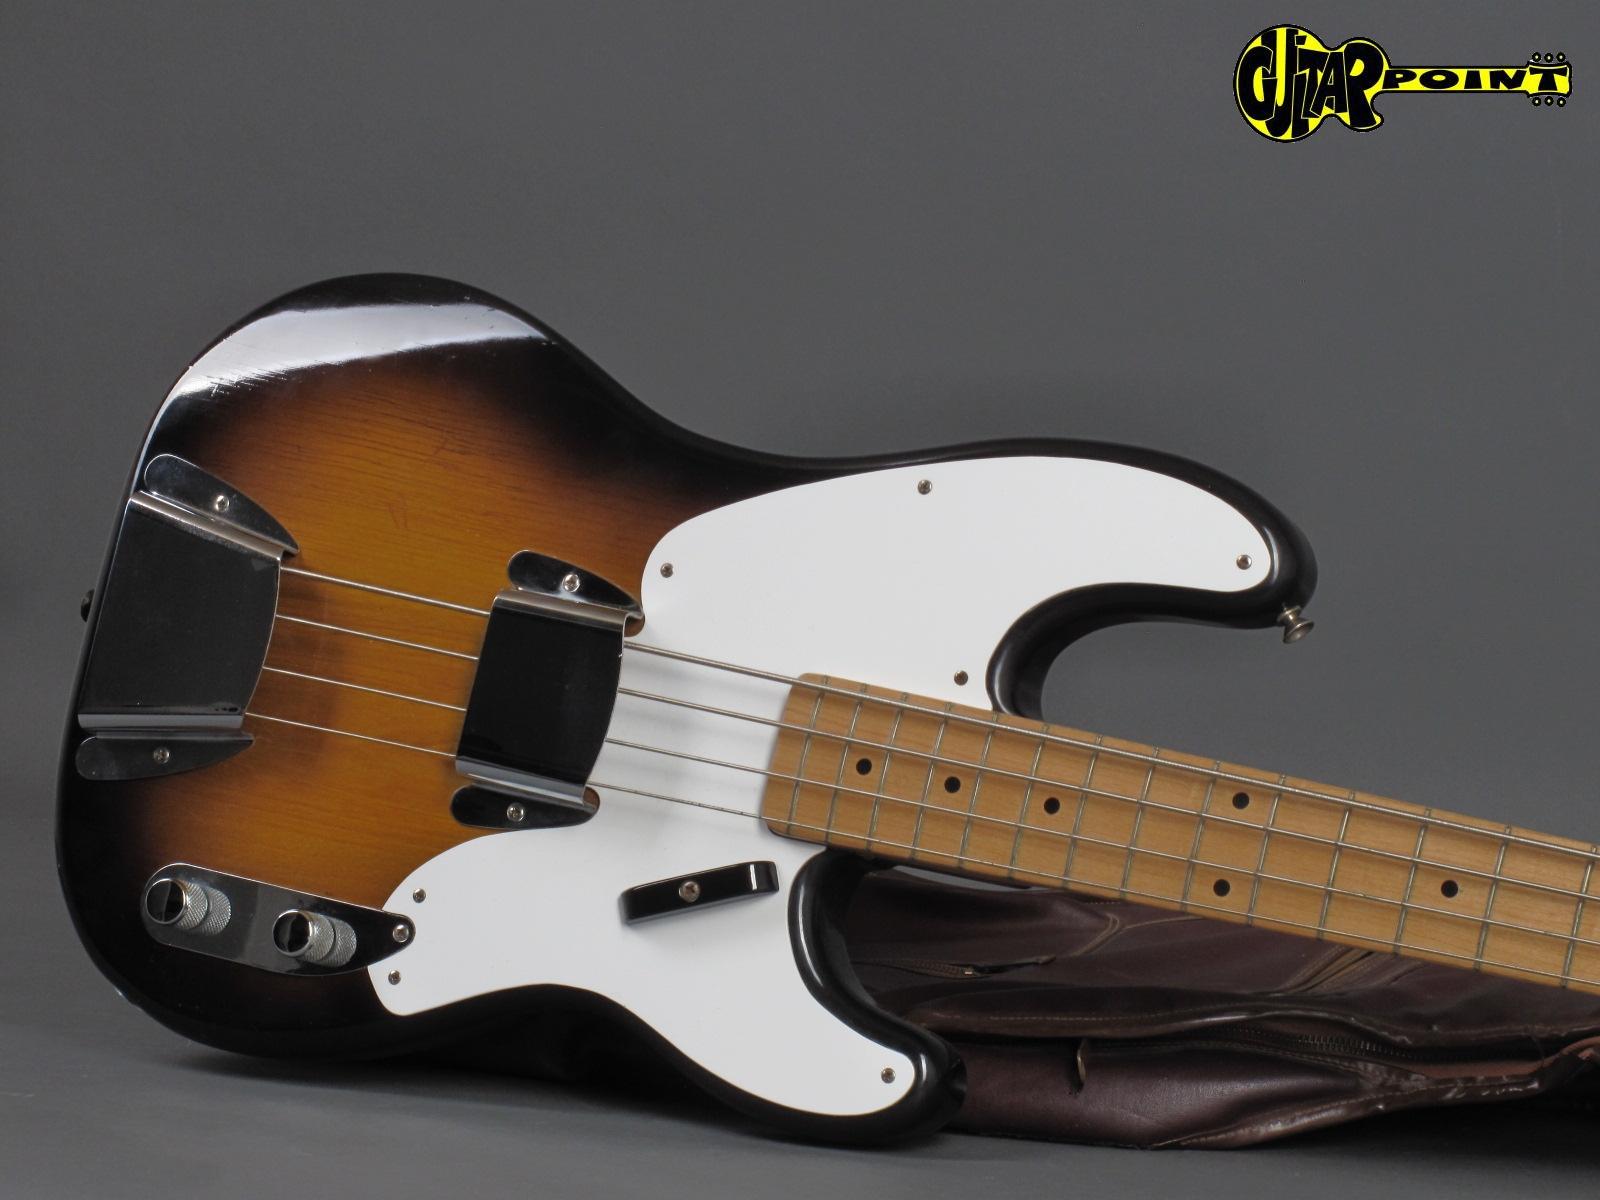 1957 fender precision bass 2 tone sunburst mint vi57fepreci2tsb15487. Black Bedroom Furniture Sets. Home Design Ideas